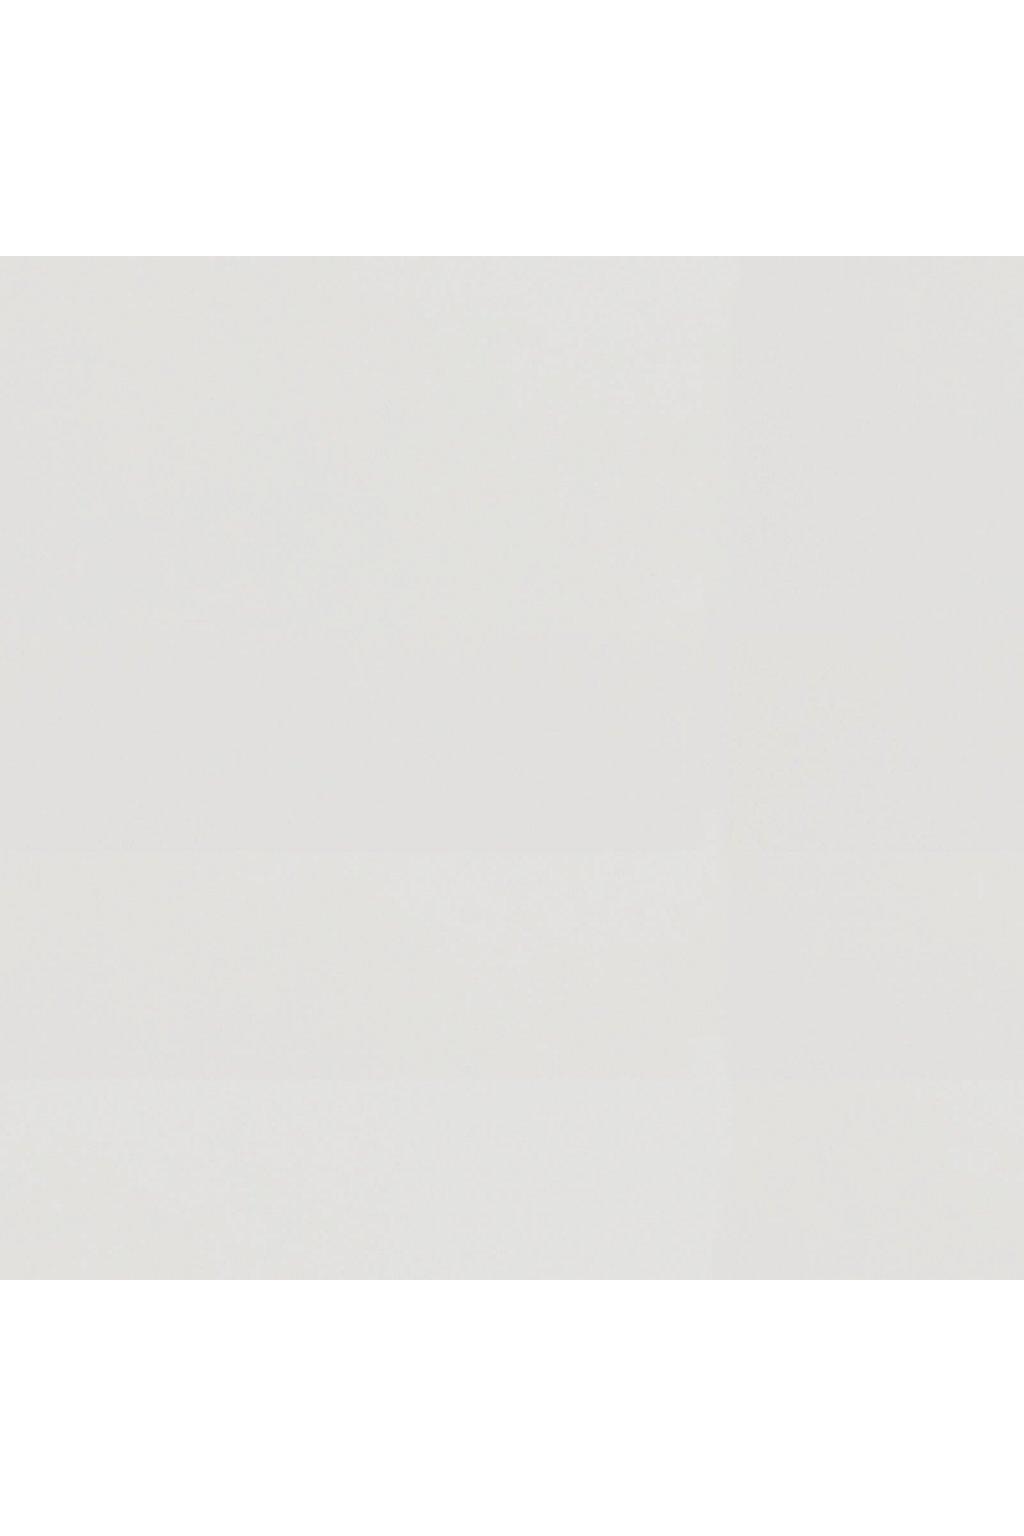 Hrany - ABS - 32x1,5 - plang - HG White HG